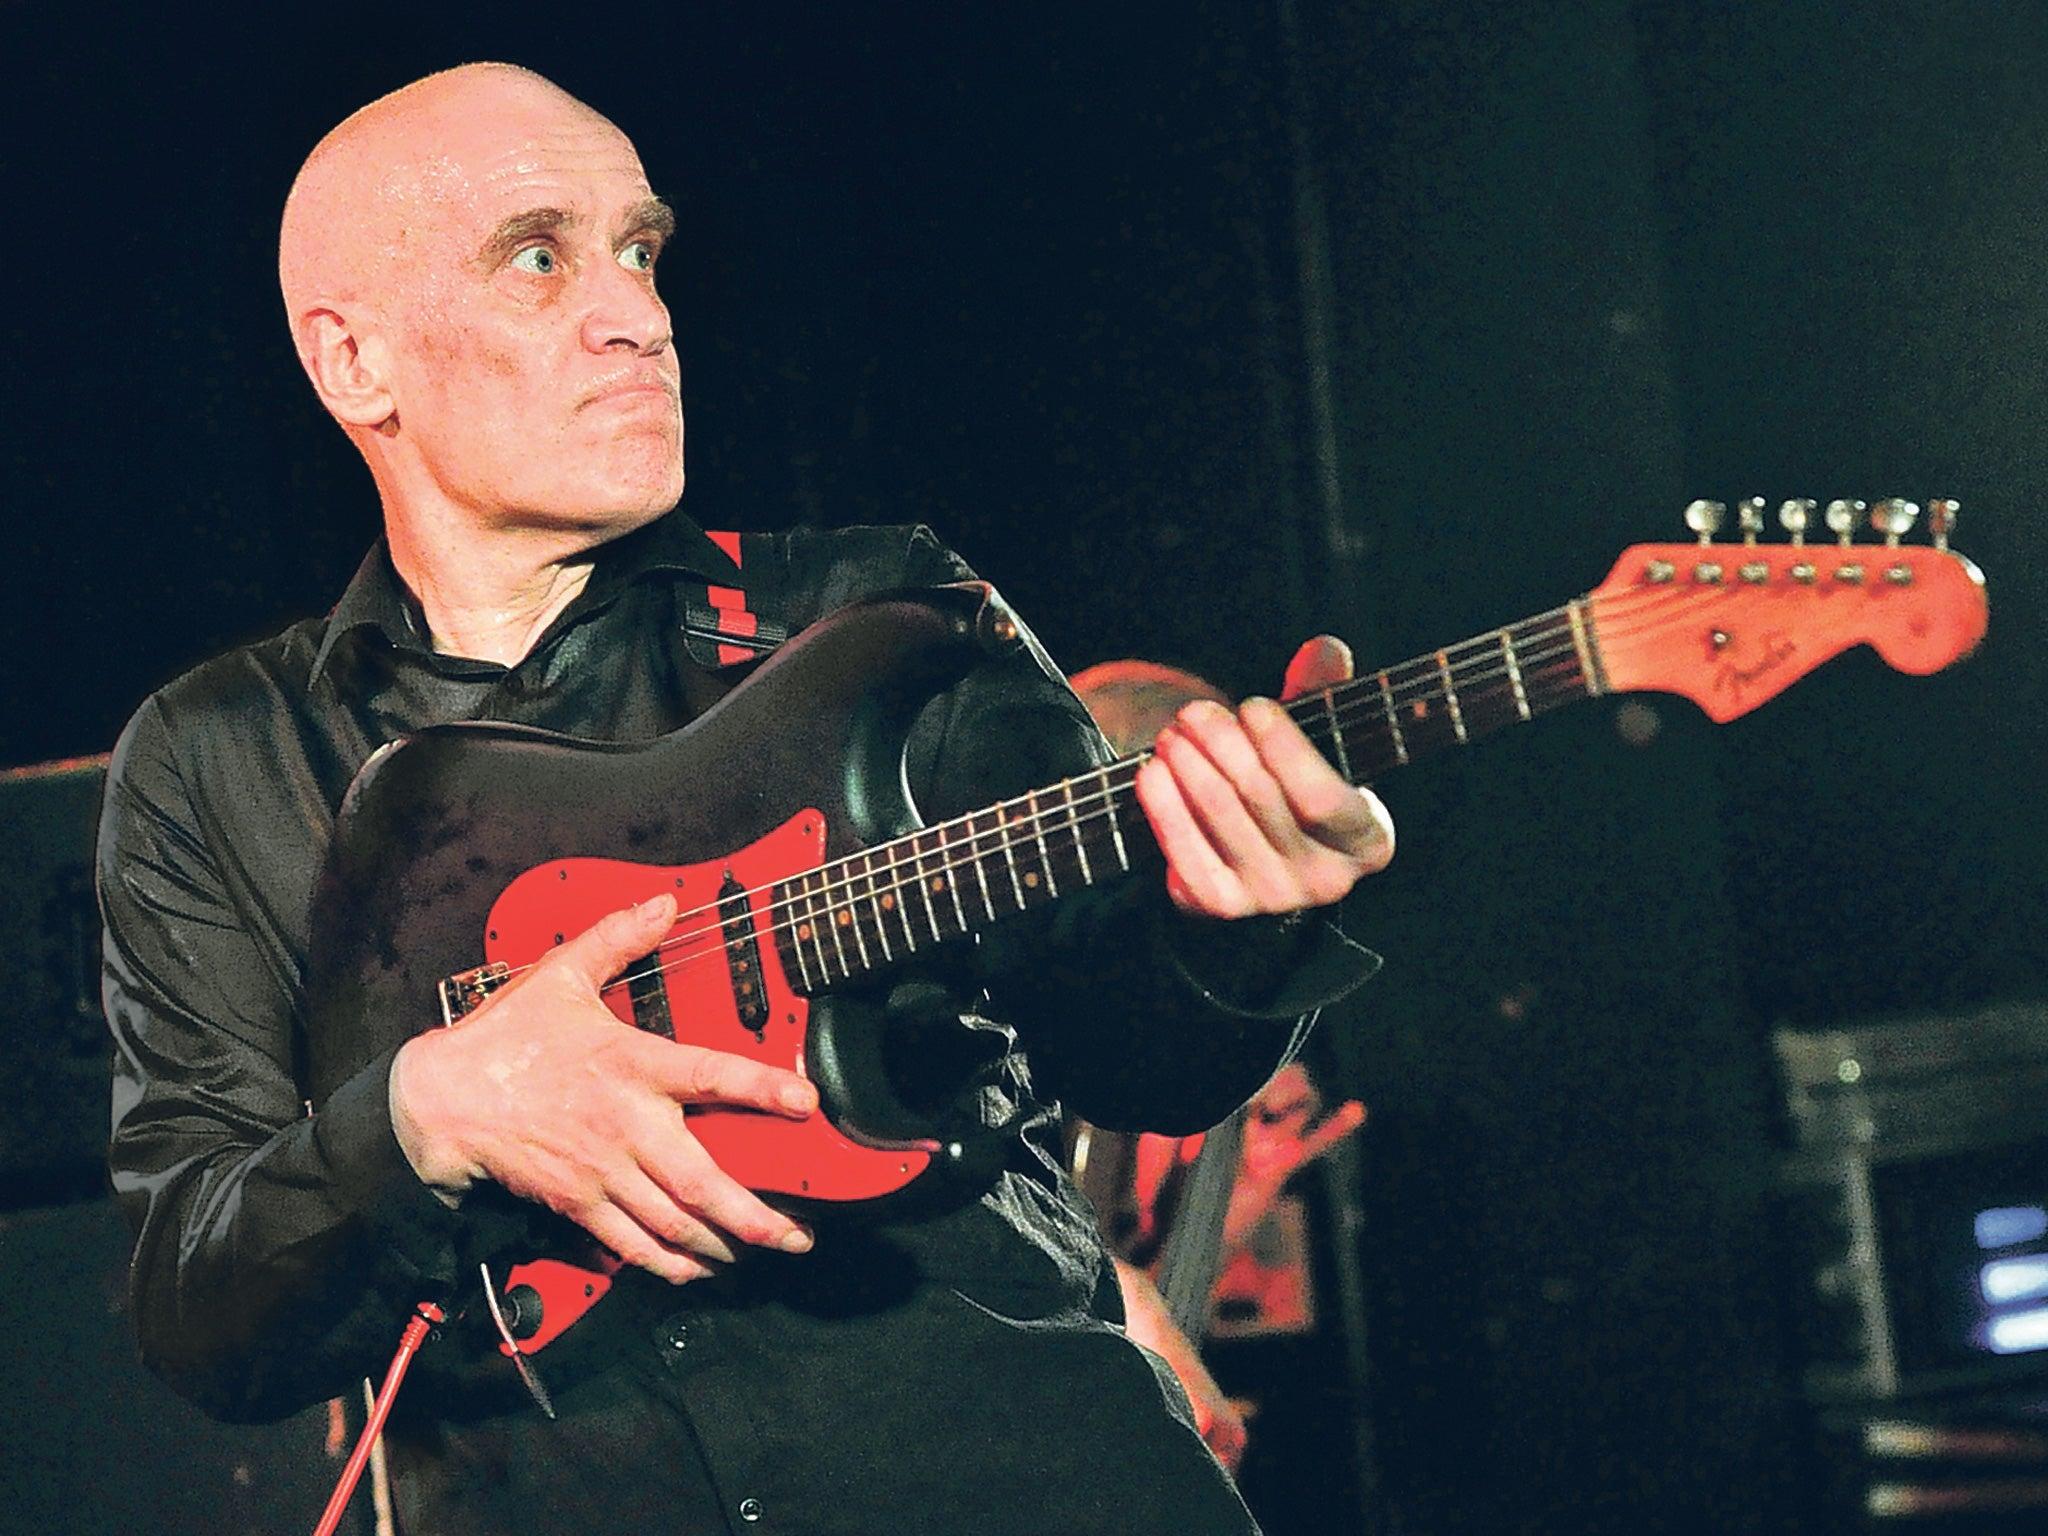 Wilko Johnson: 'I'm supposed to be dead' - music hero ...